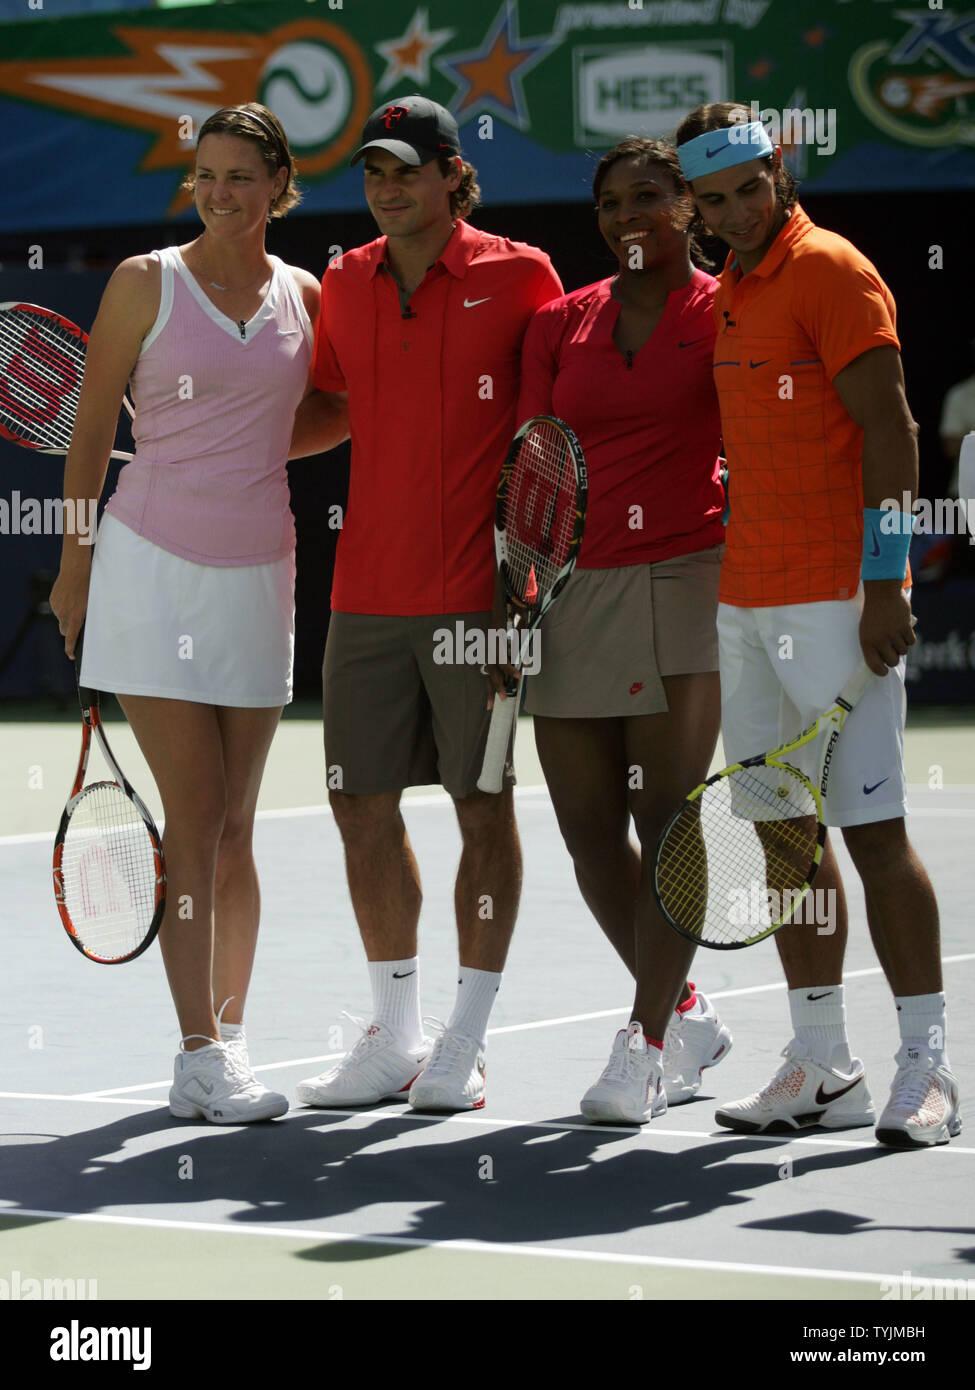 L R Lindsay Davenport Roger Federer Serena Williams And Rafael Nadal Take Part In The Arthur Ashe Kids Day At The Usta Billie Jean King National Tennis Center In New York On August